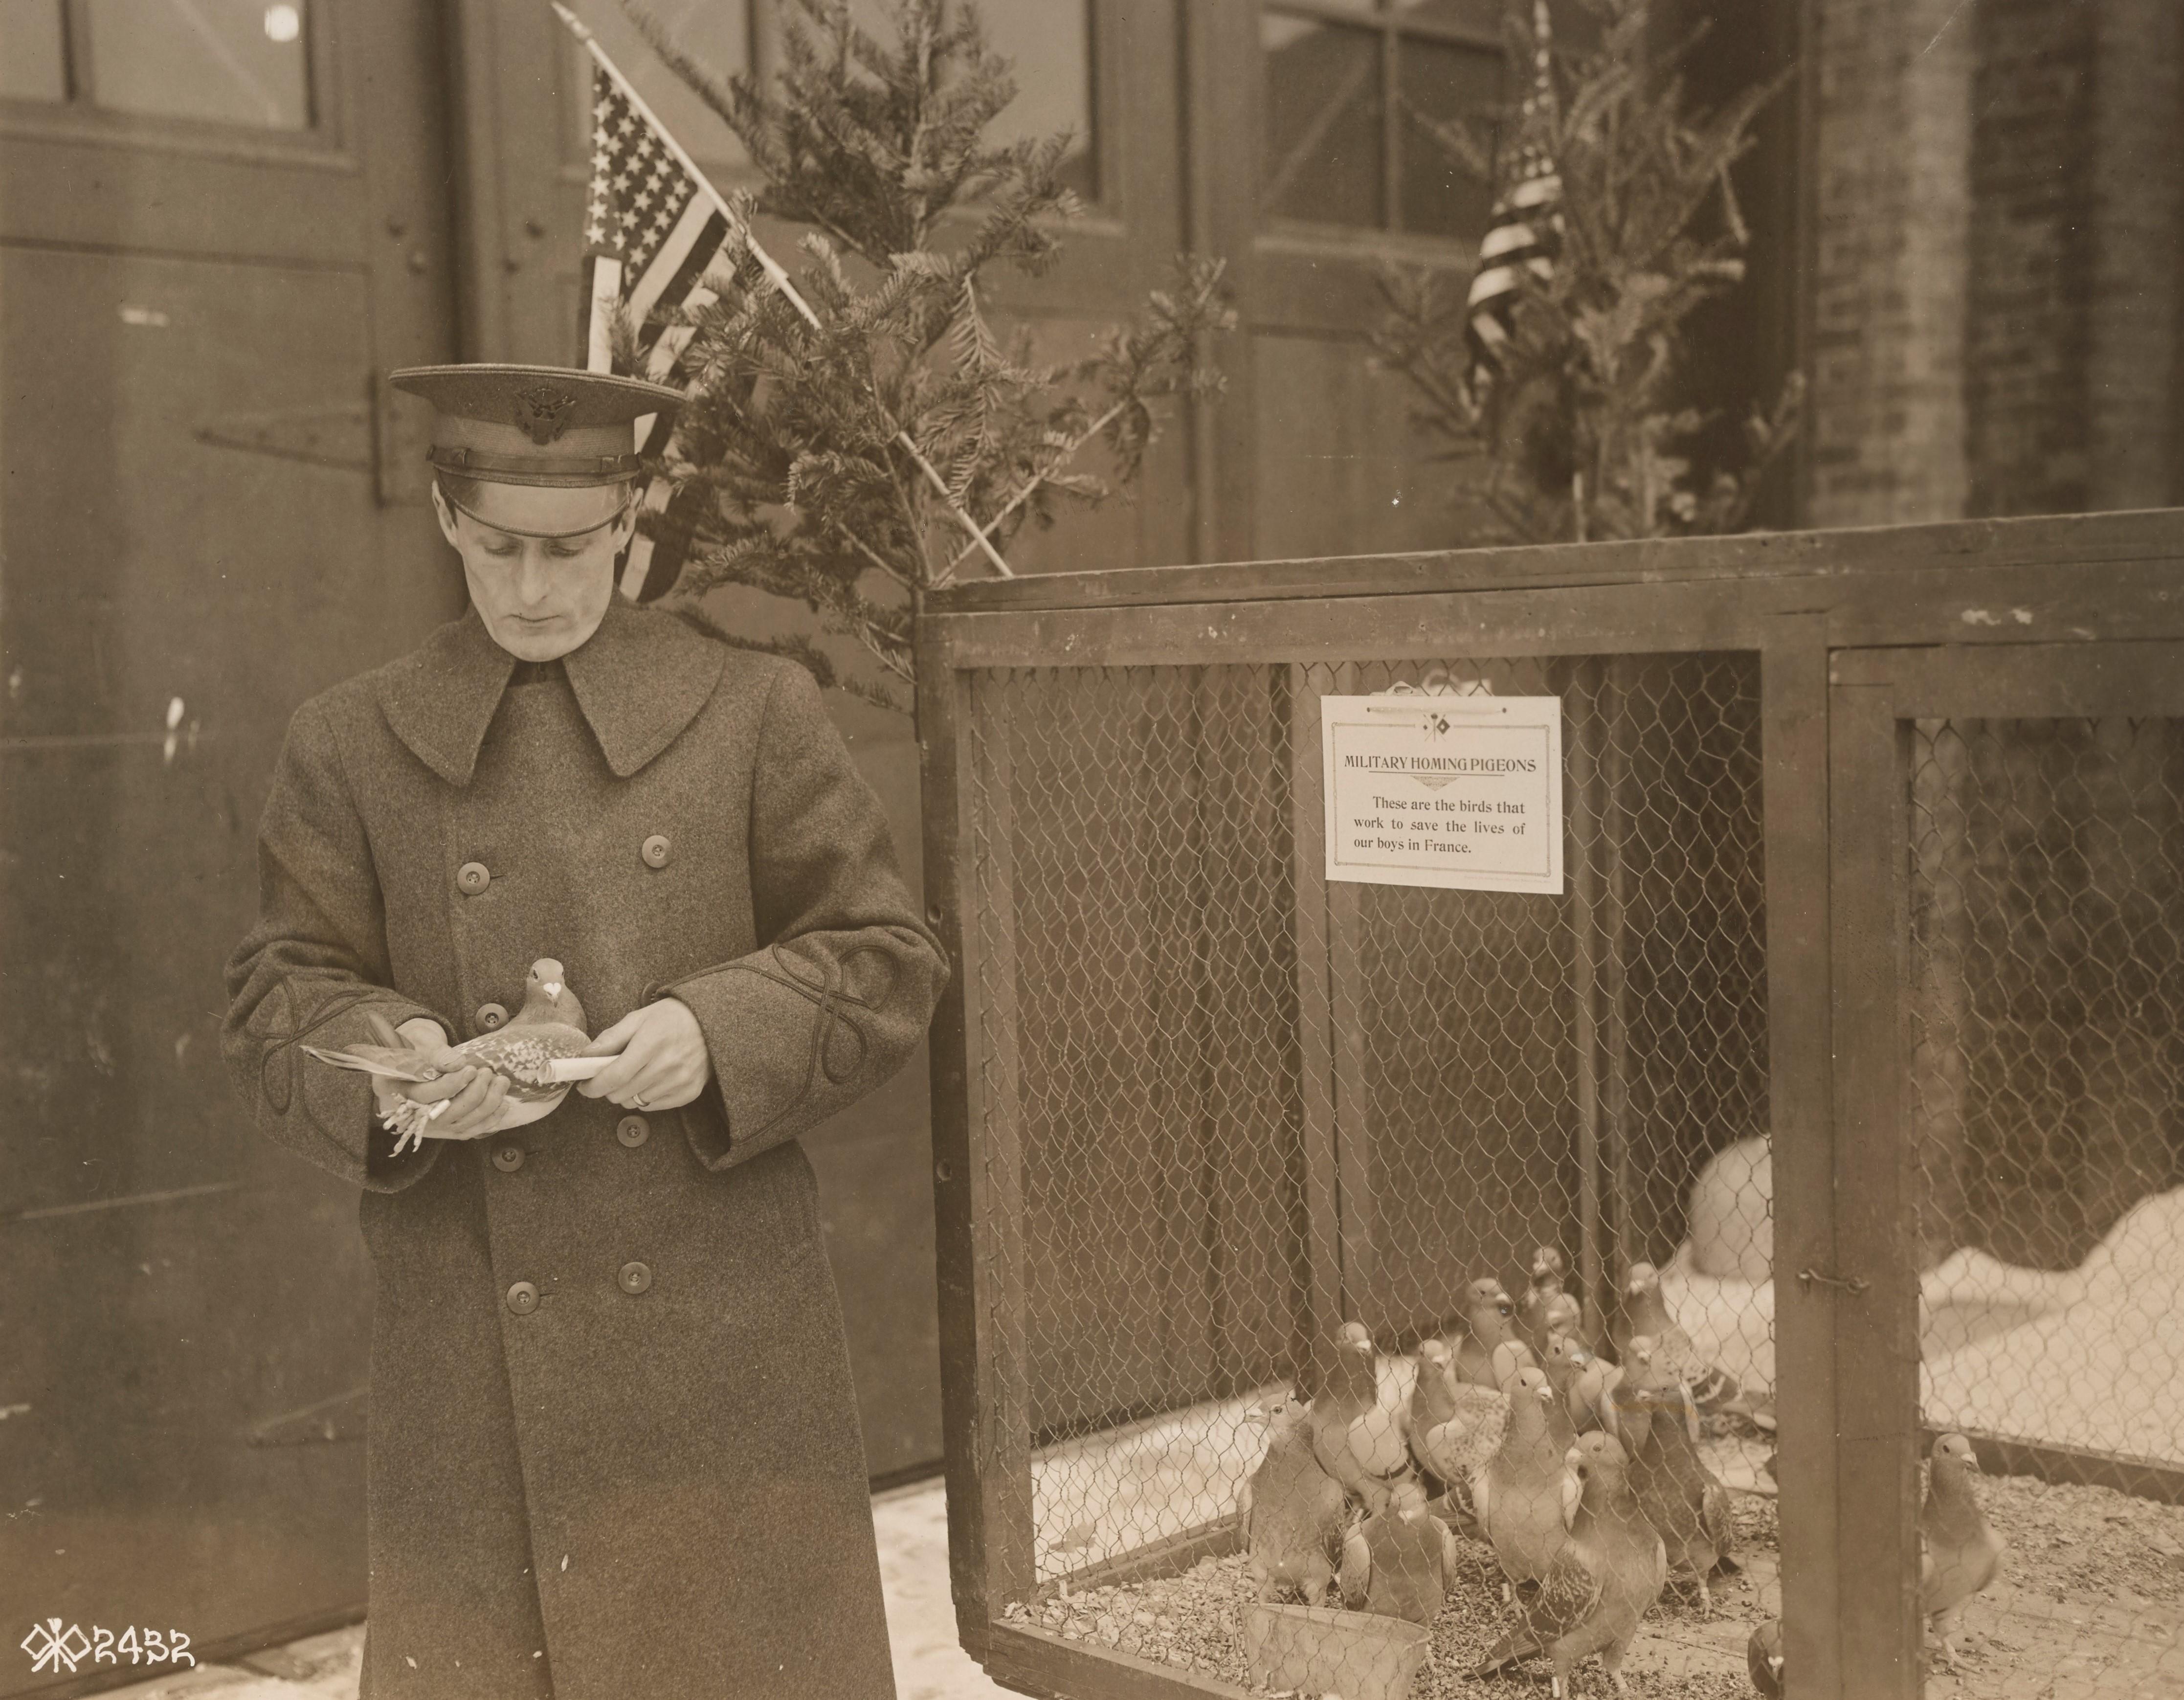 Allied leaders of World War I